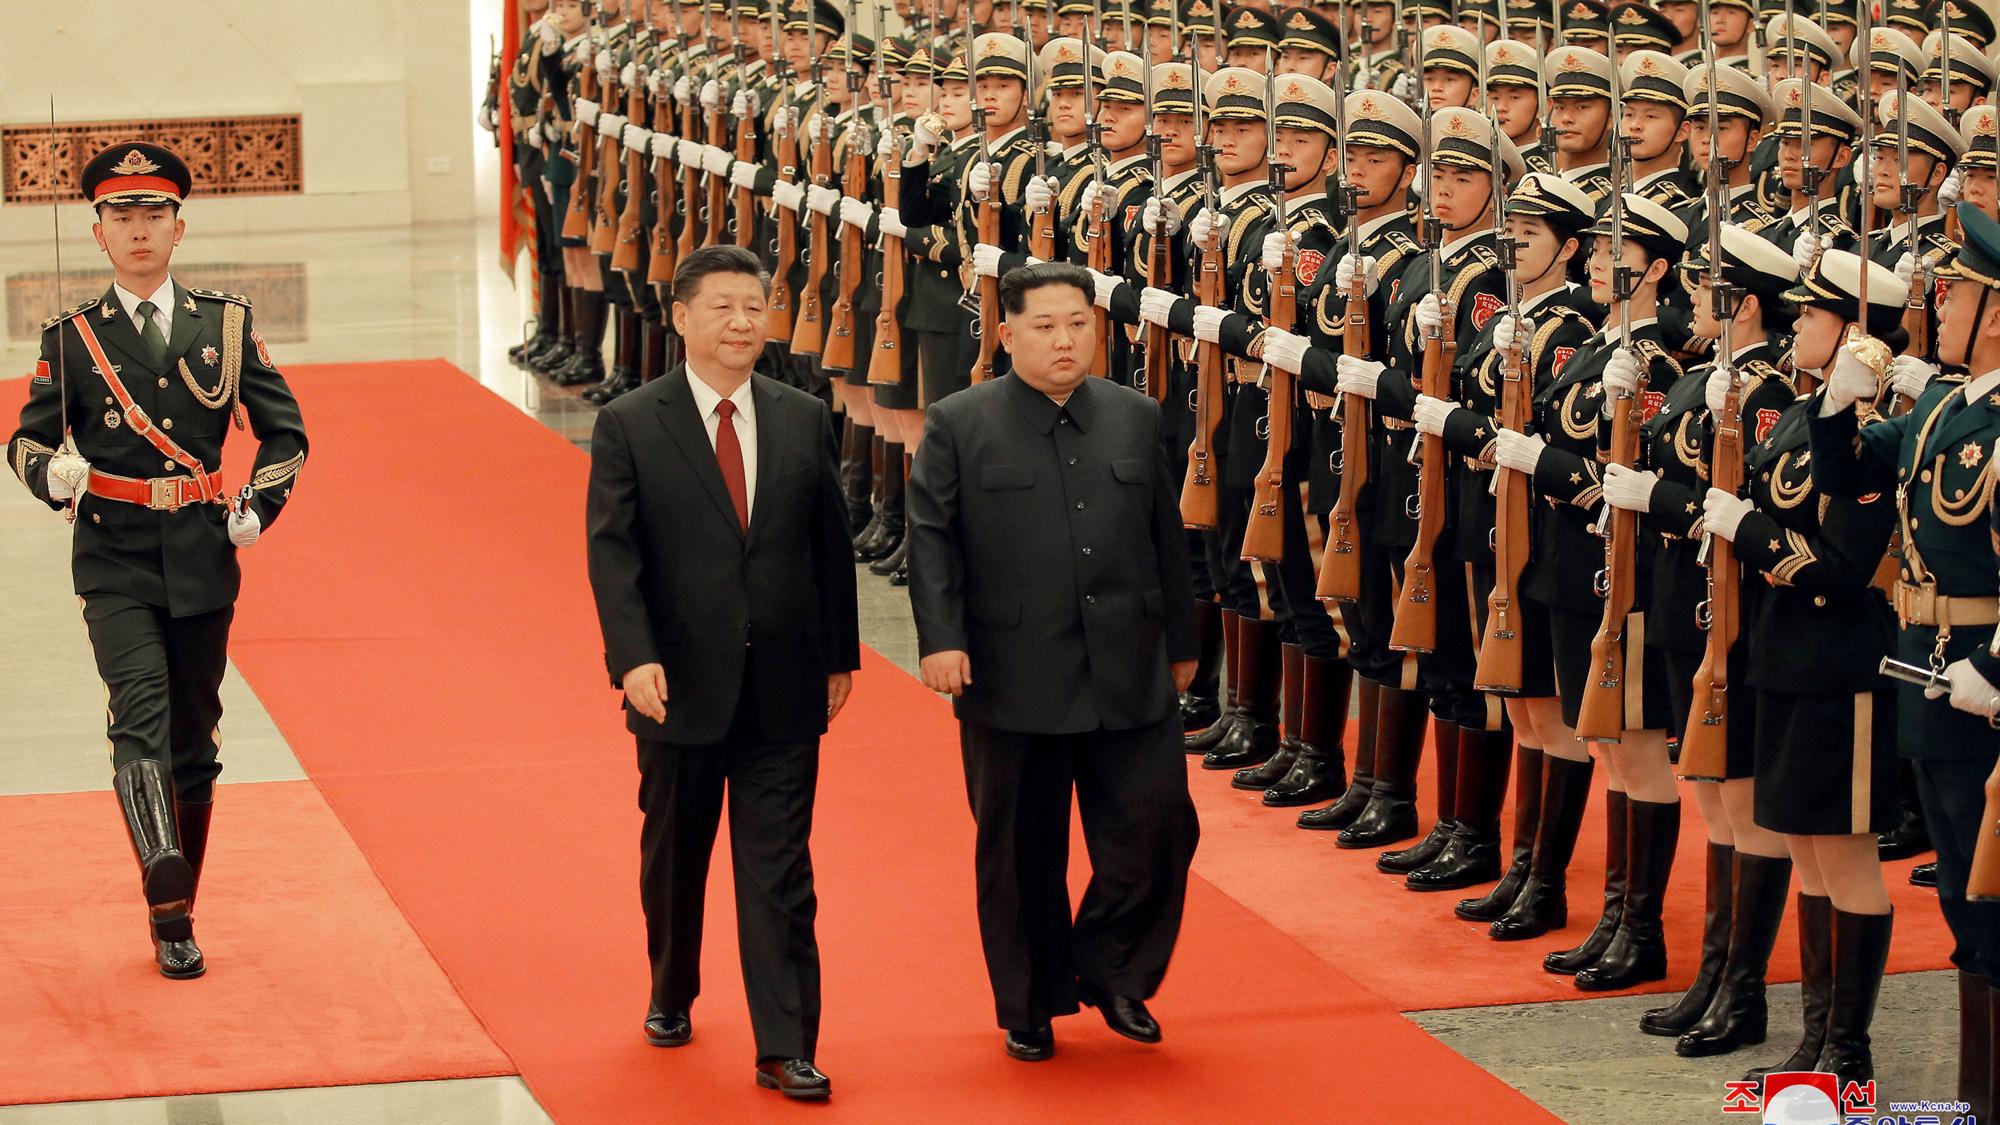 North Korean leader Kim Jong-un and Chinese President Xi Jinping walk past an rifle-clad honor guard.